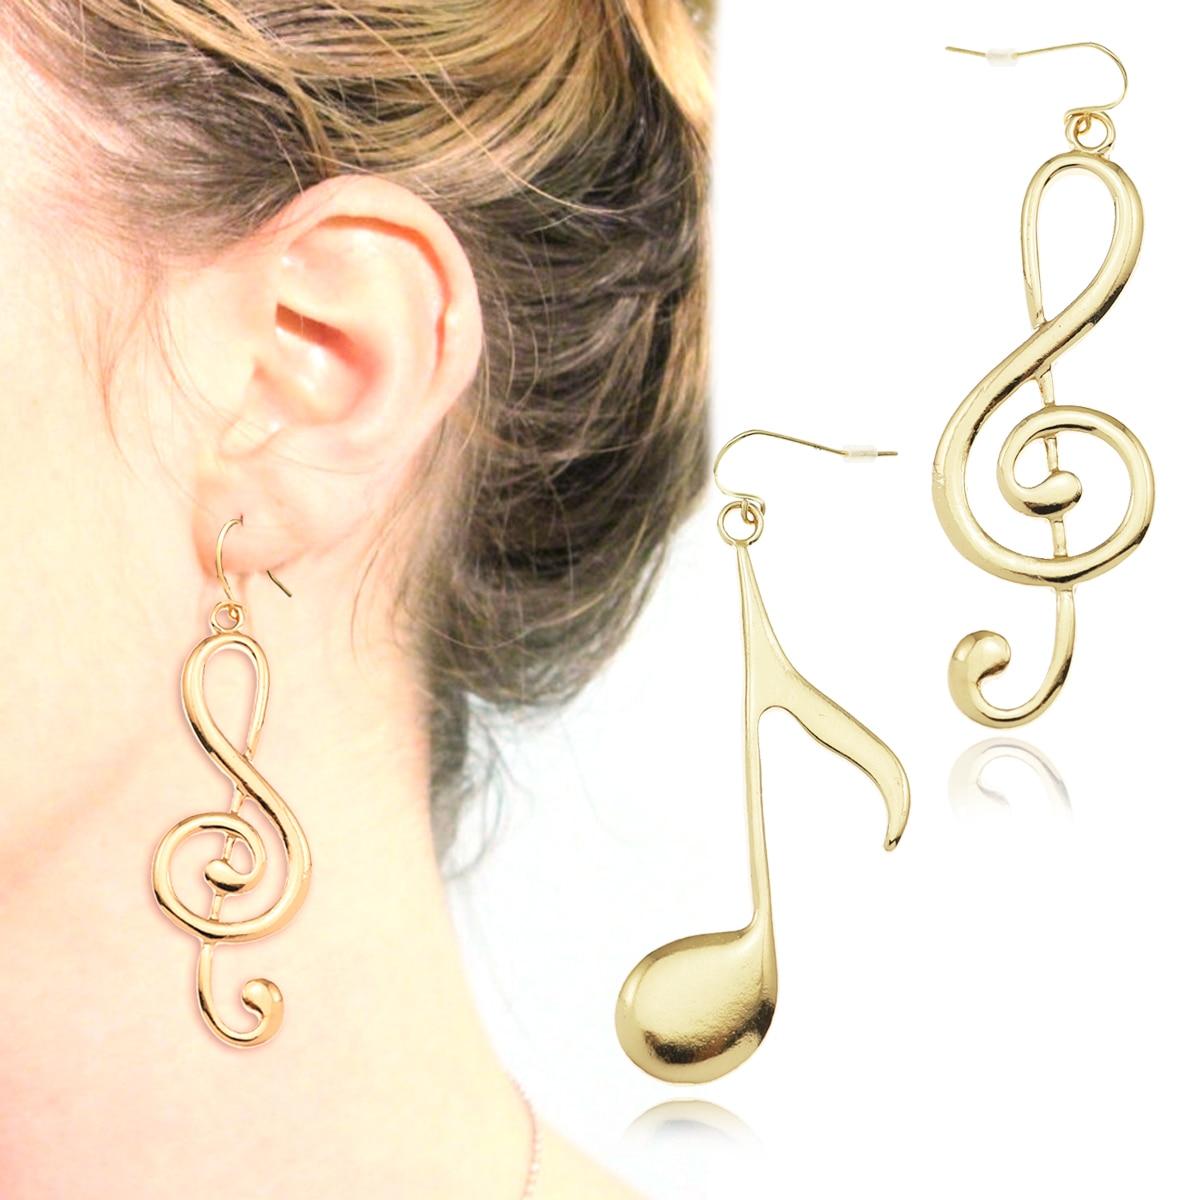 Details about  /Pearl Tiger Eye Sterling Silver Drop Dangle Earrings Jewelry Gift Women Mom Her